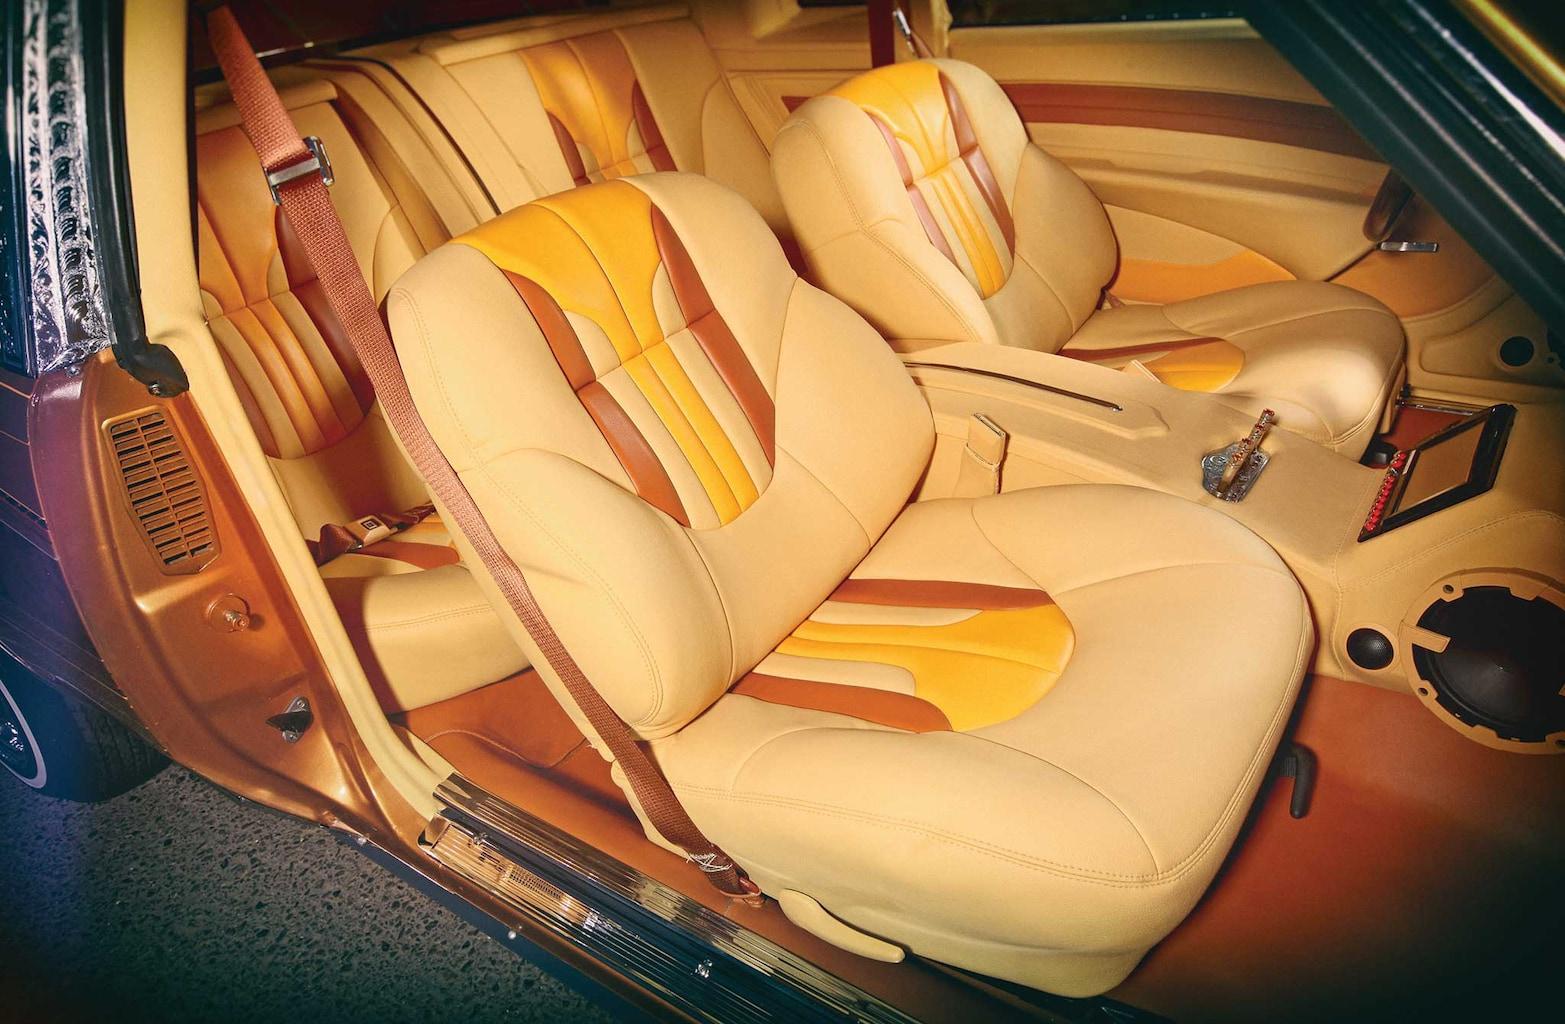 1986 buick regal ultraleather interior 004